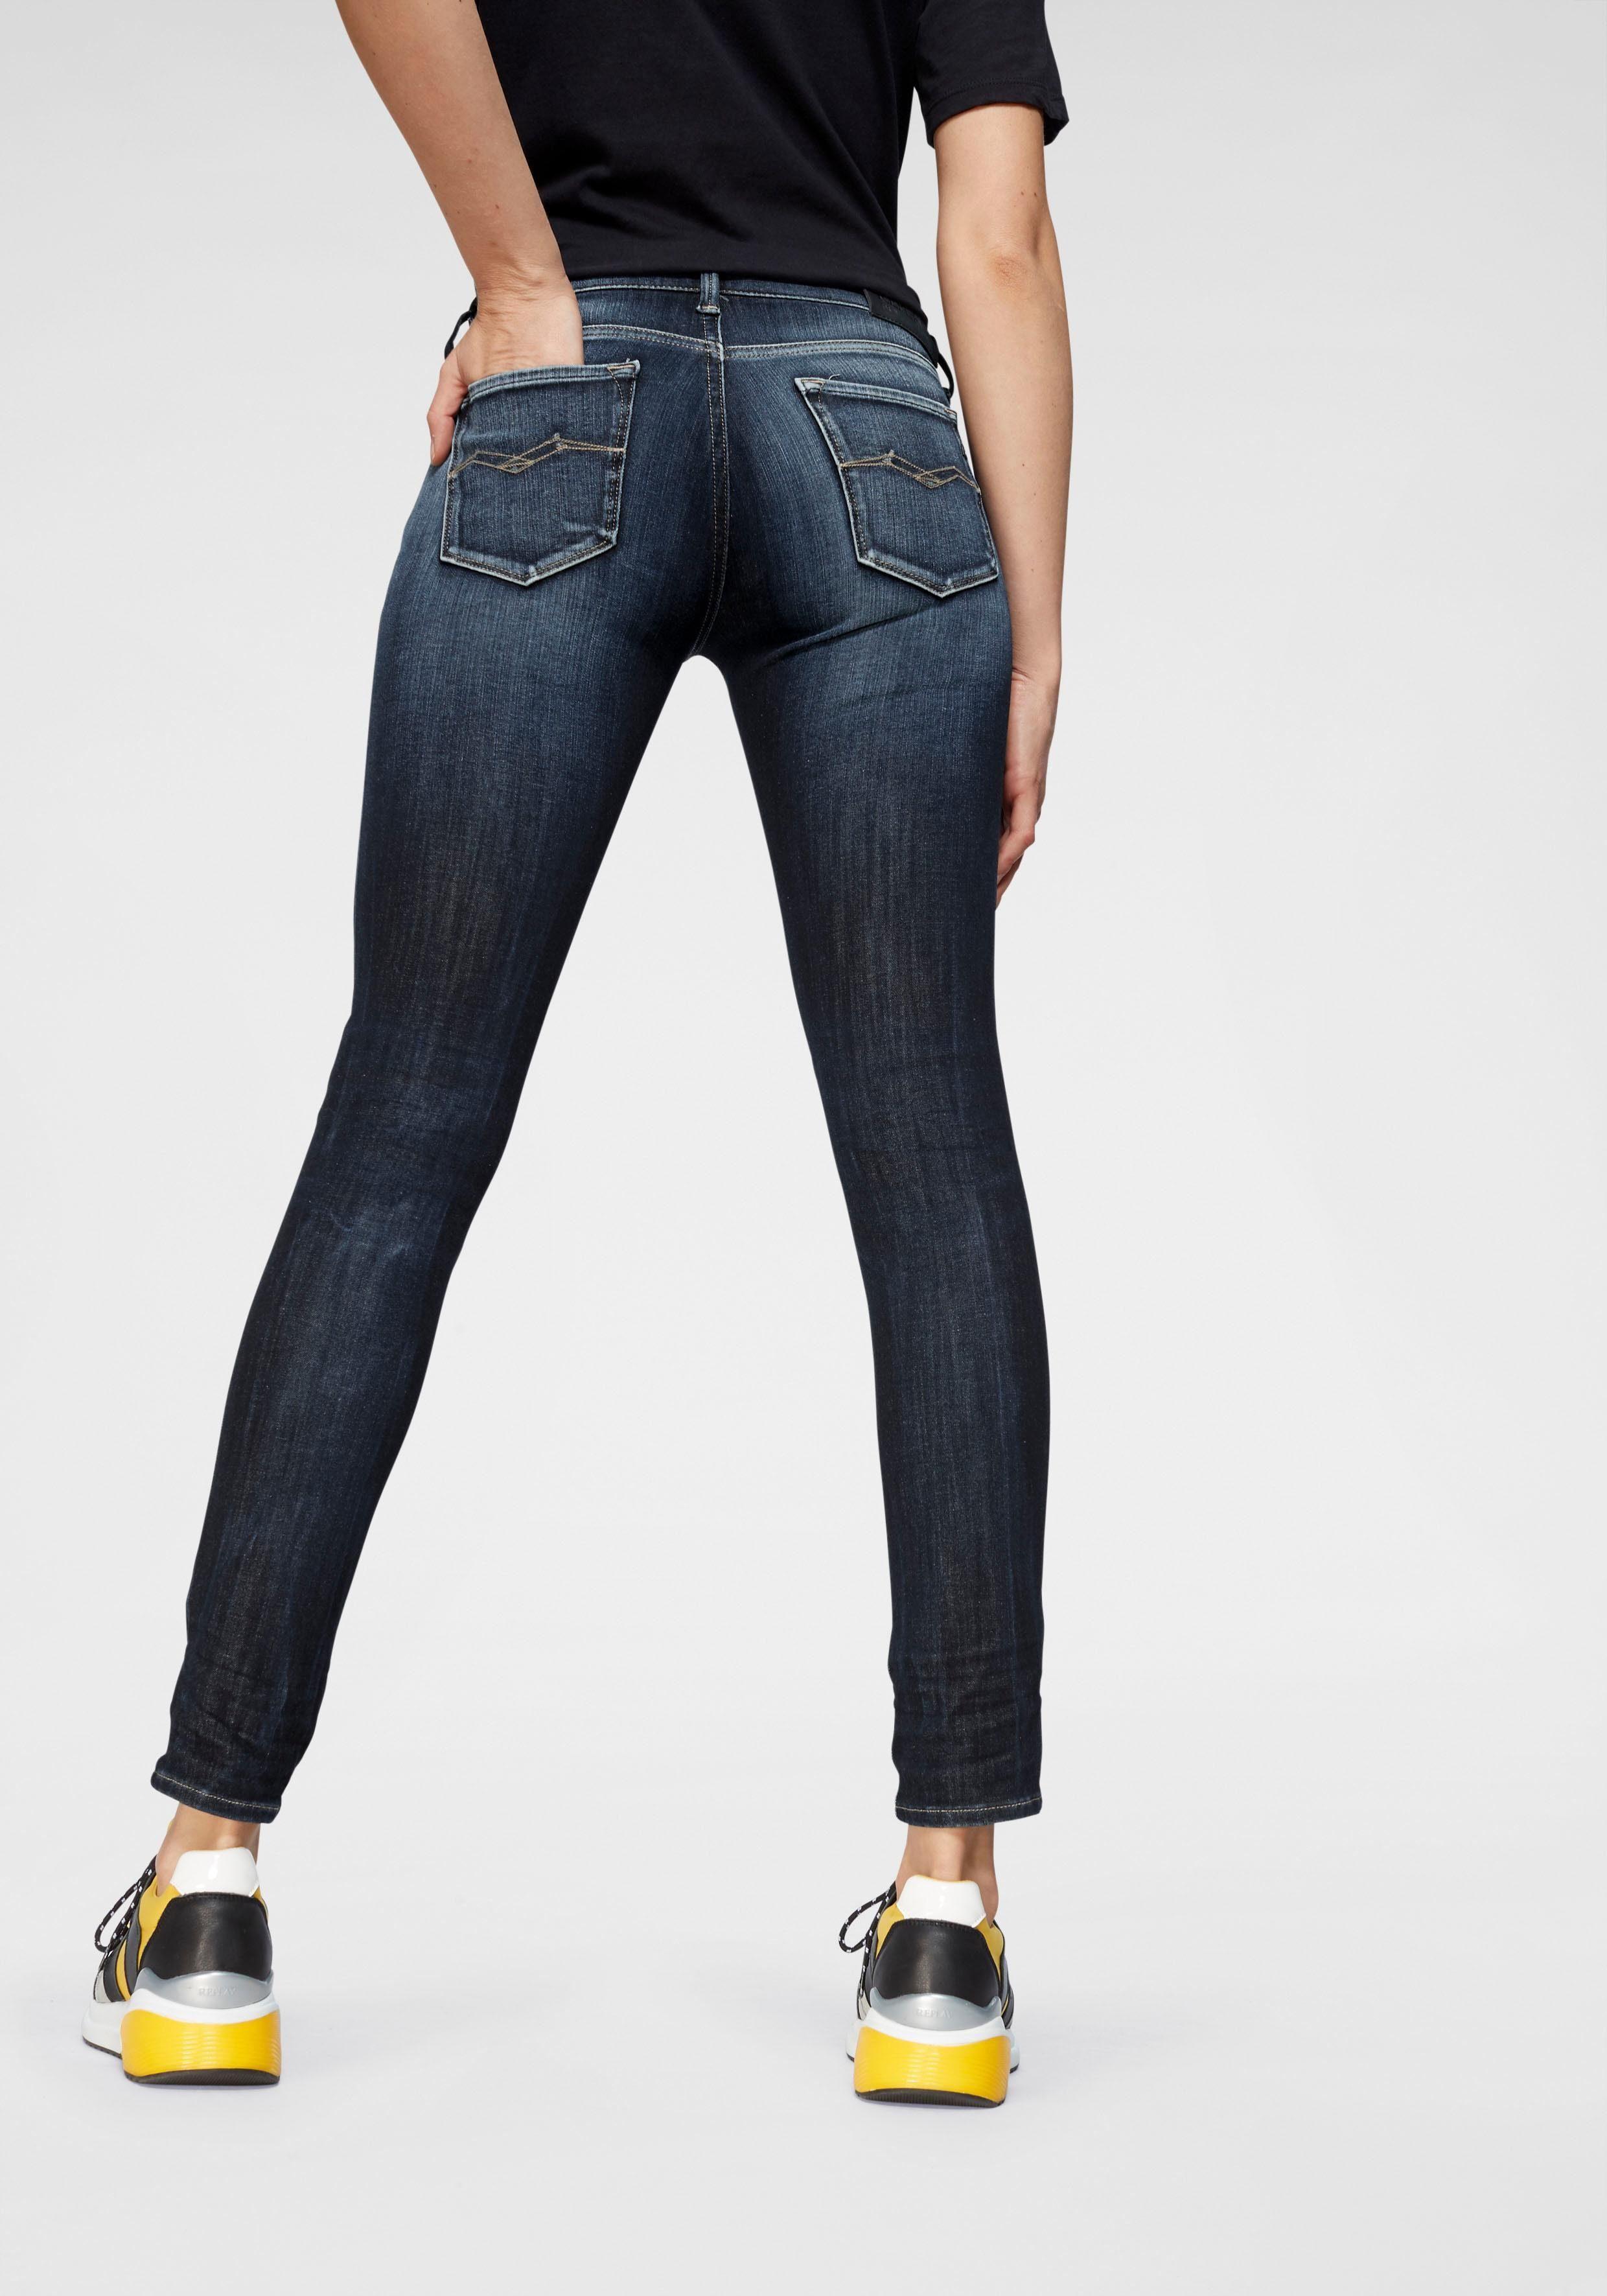 »luz jeans stil Skinny Replay Im Hpf fit 5 « pocket TRPnq1w